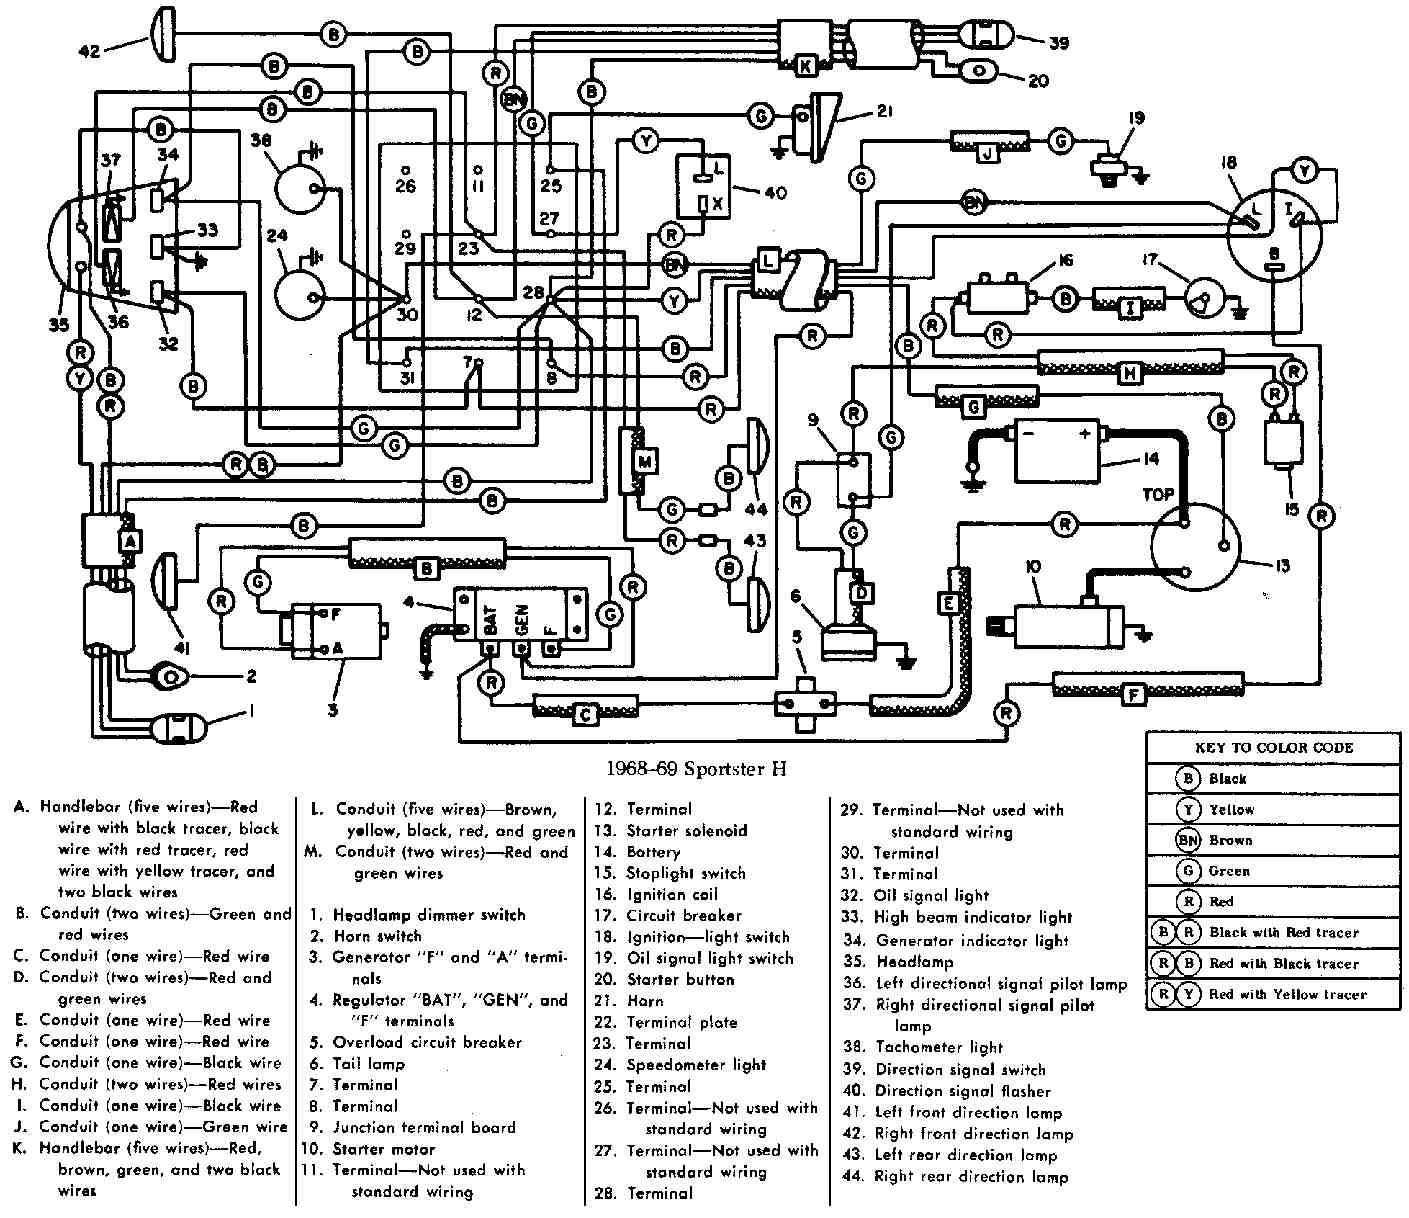 94 harley softail wiring diagram wiring diagram blog 1991 fatboy diagram of ignition switch [ 1409 x 1218 Pixel ]